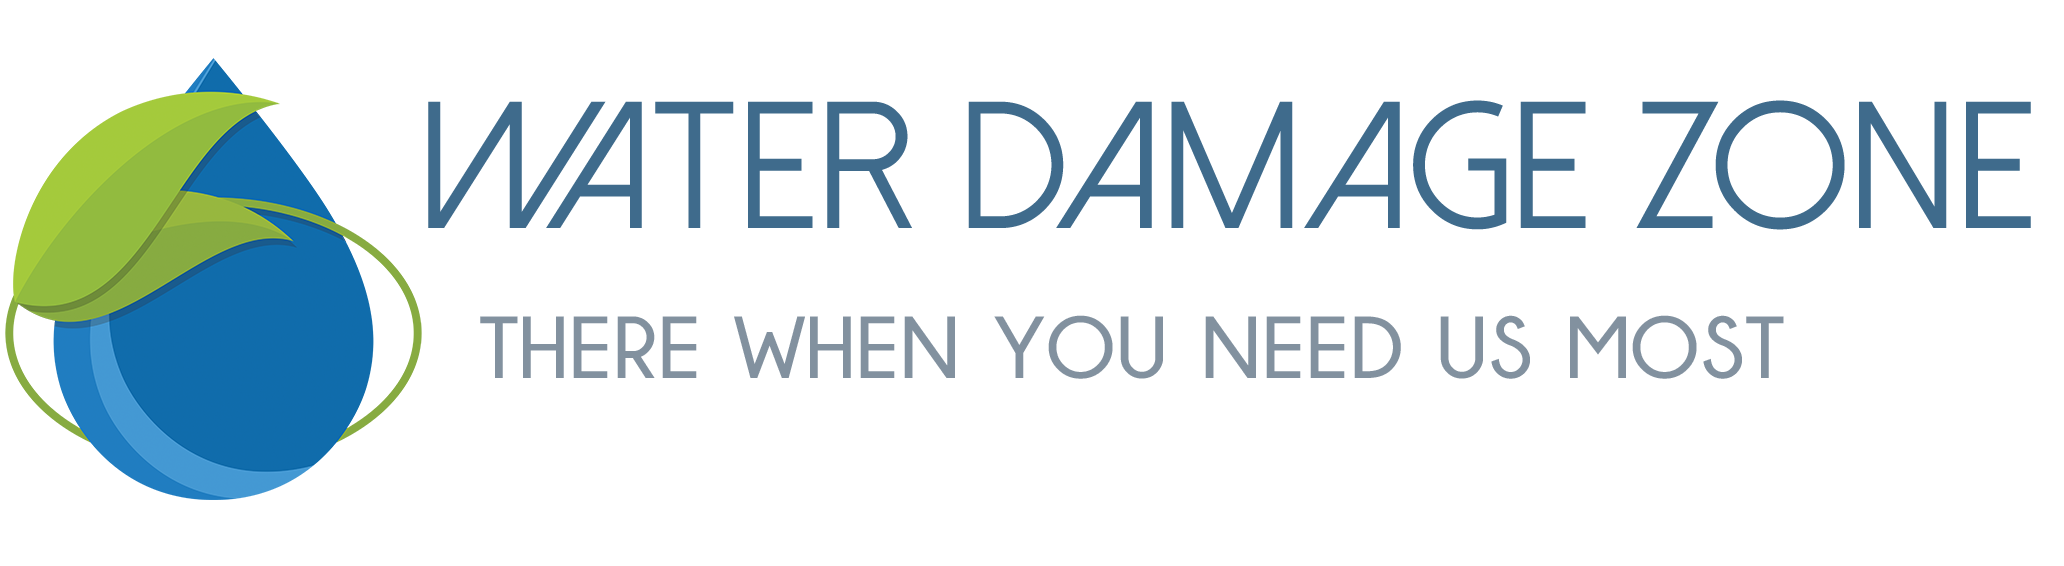 Water Damage Zone